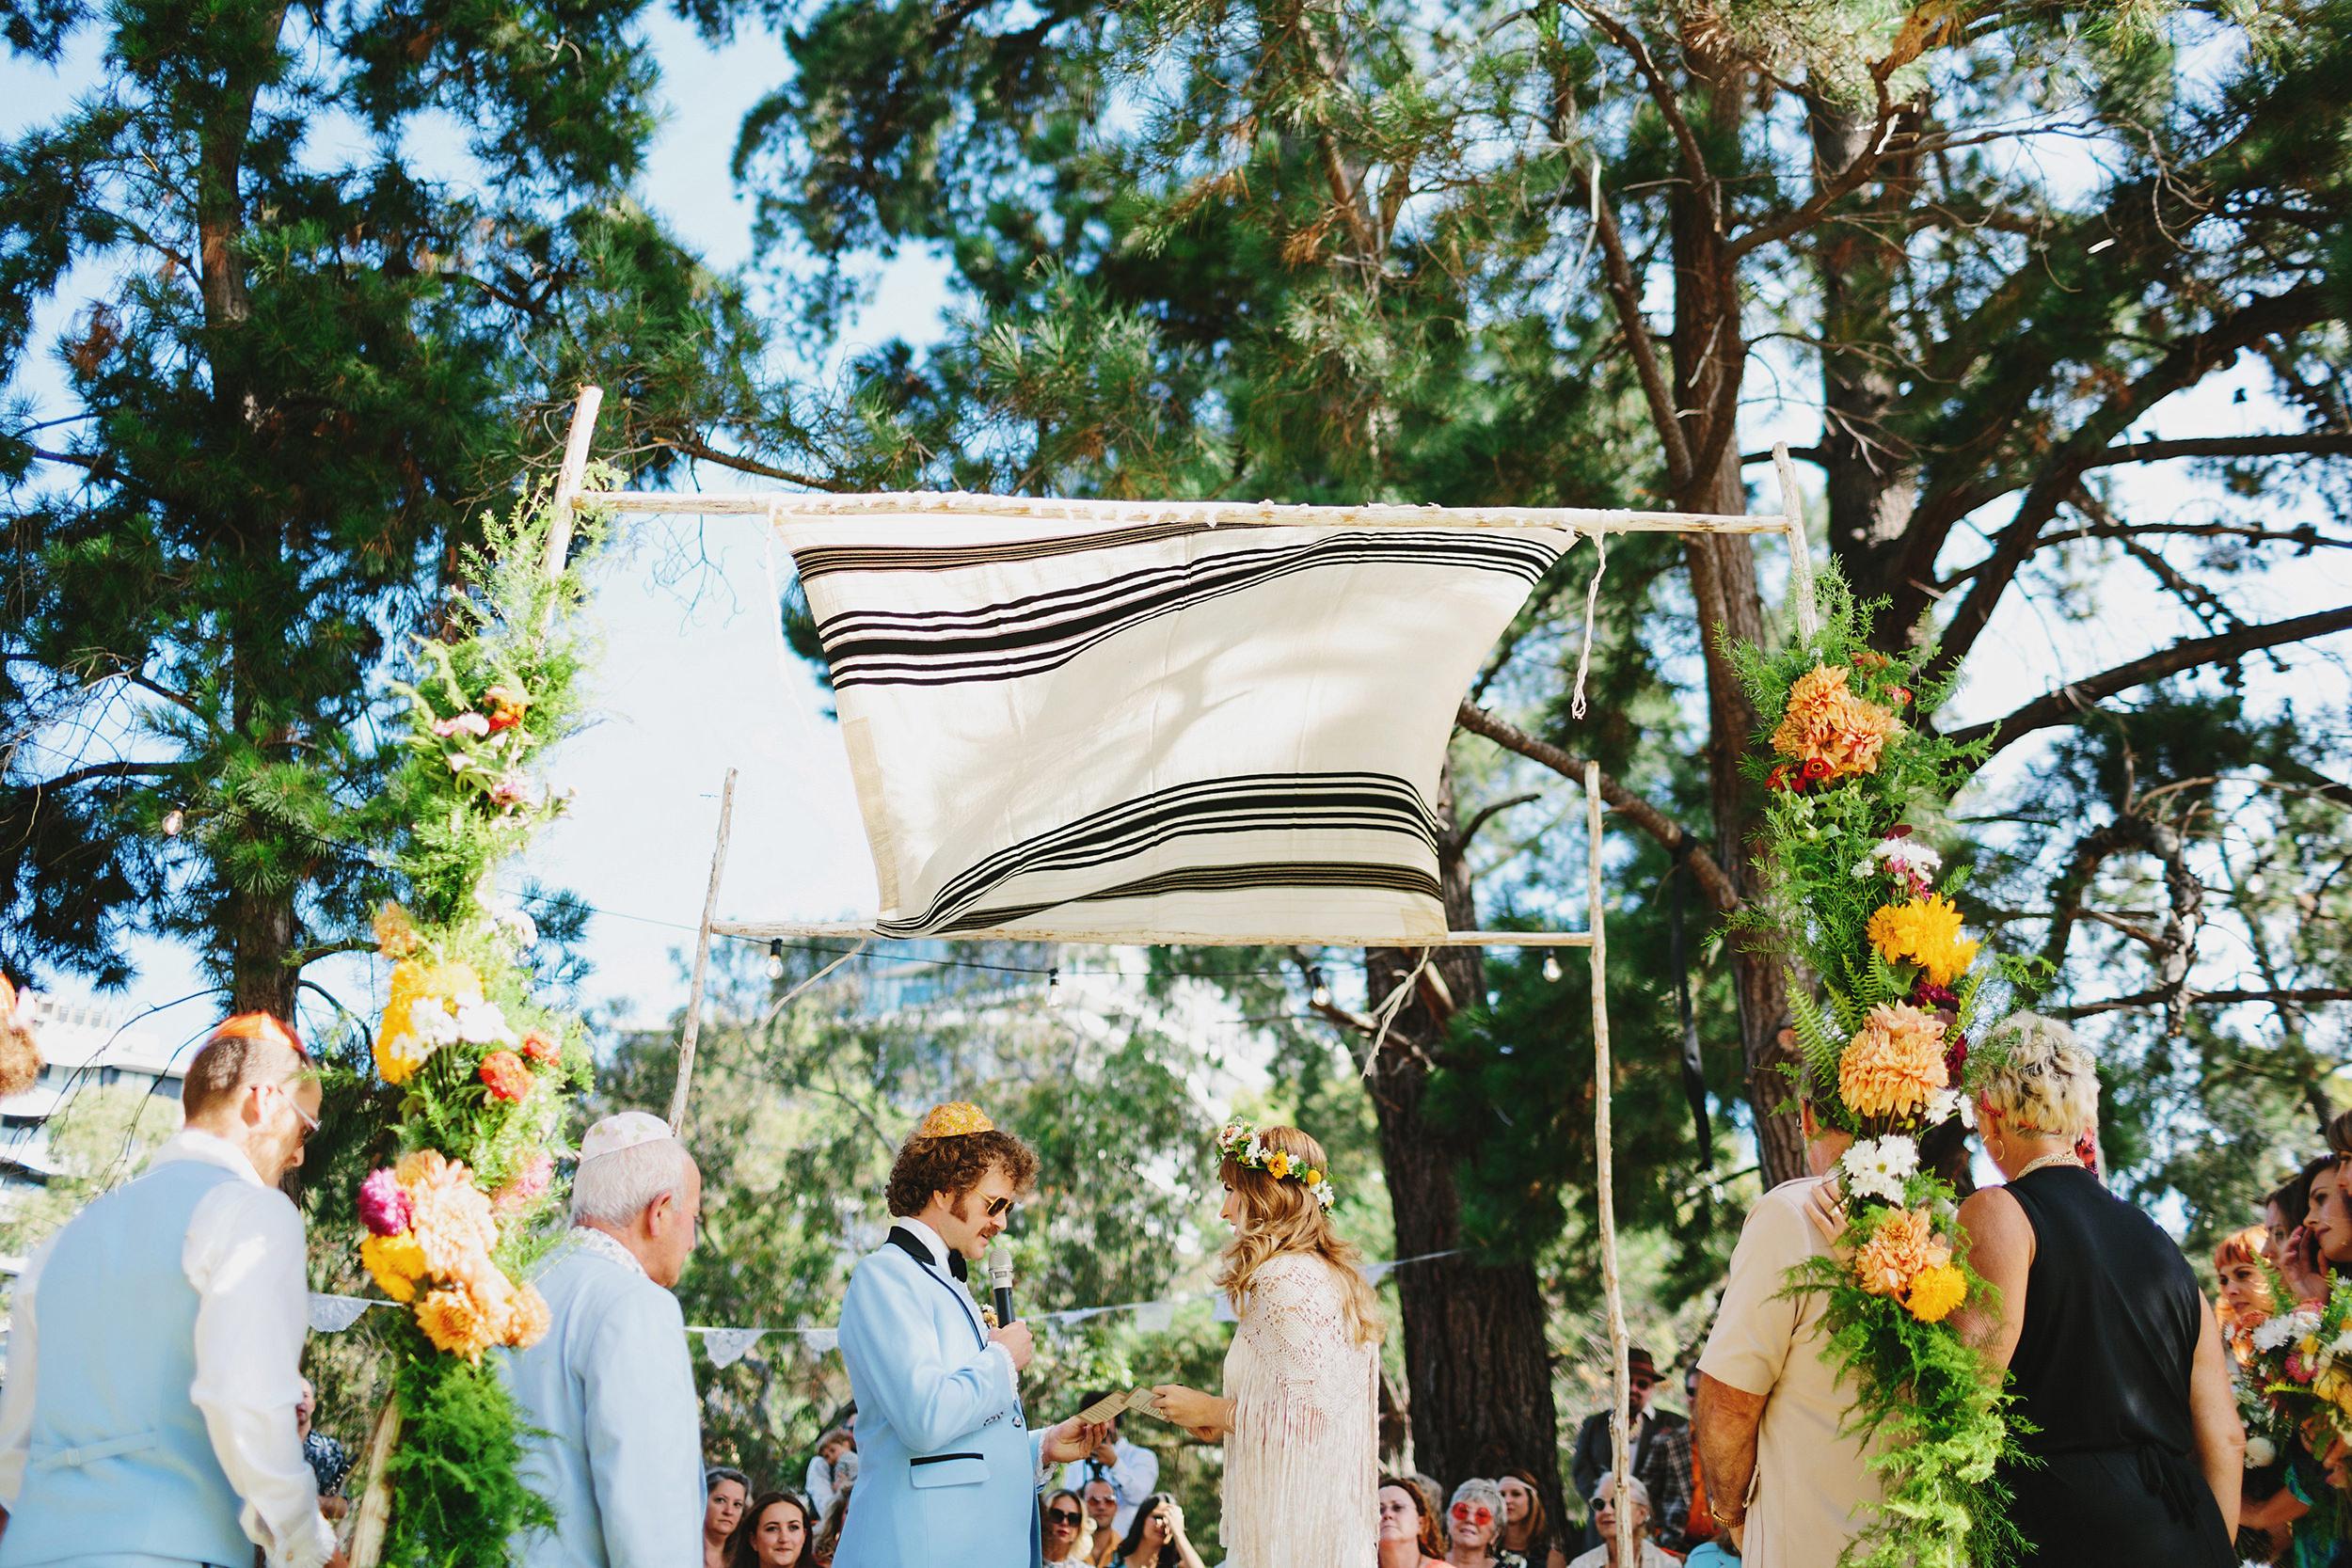 Melbourne_Vintage_Backyard_Wedding_Ben_Erin 032.JPG